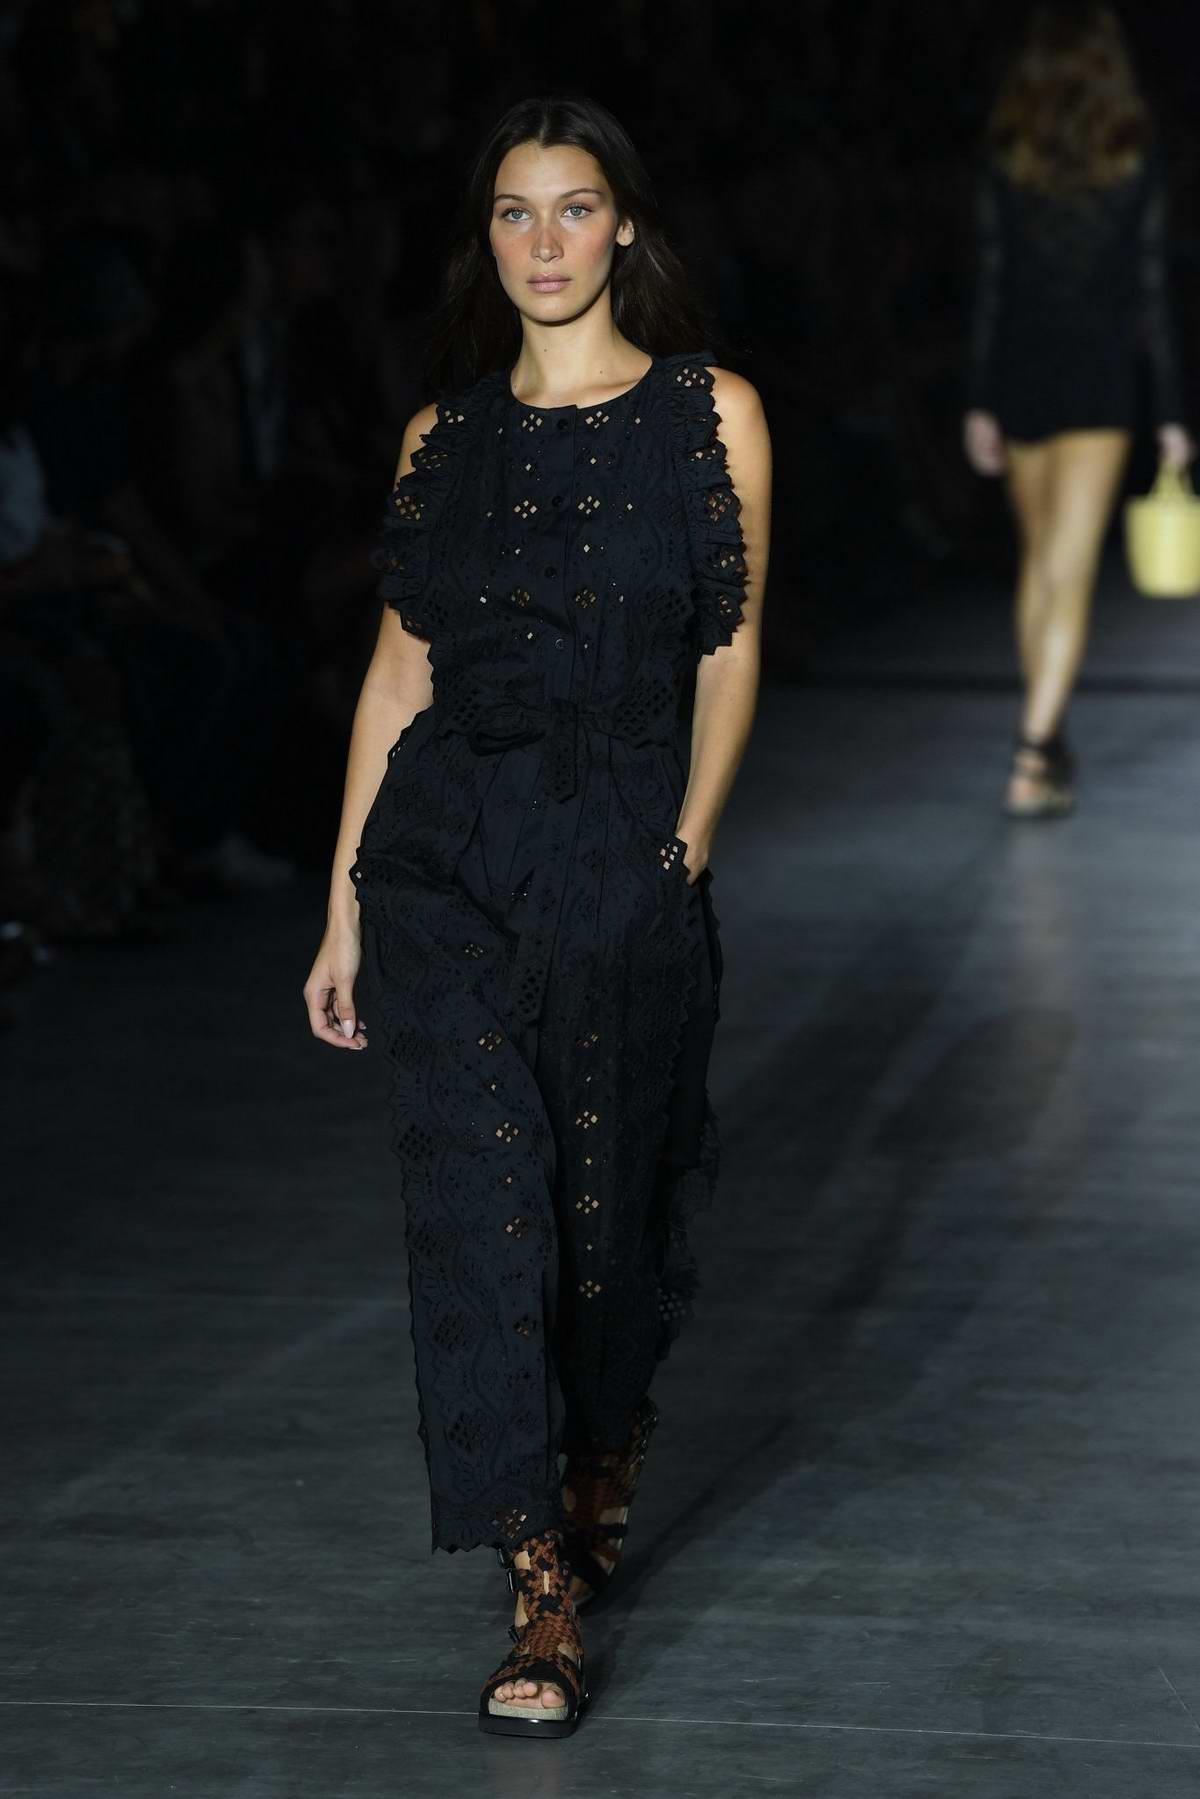 Bella Hadid walks the runway for Alberta Ferretti Show, Spring/Summer 2019 during Milan Fashion Week in Milan, Italy